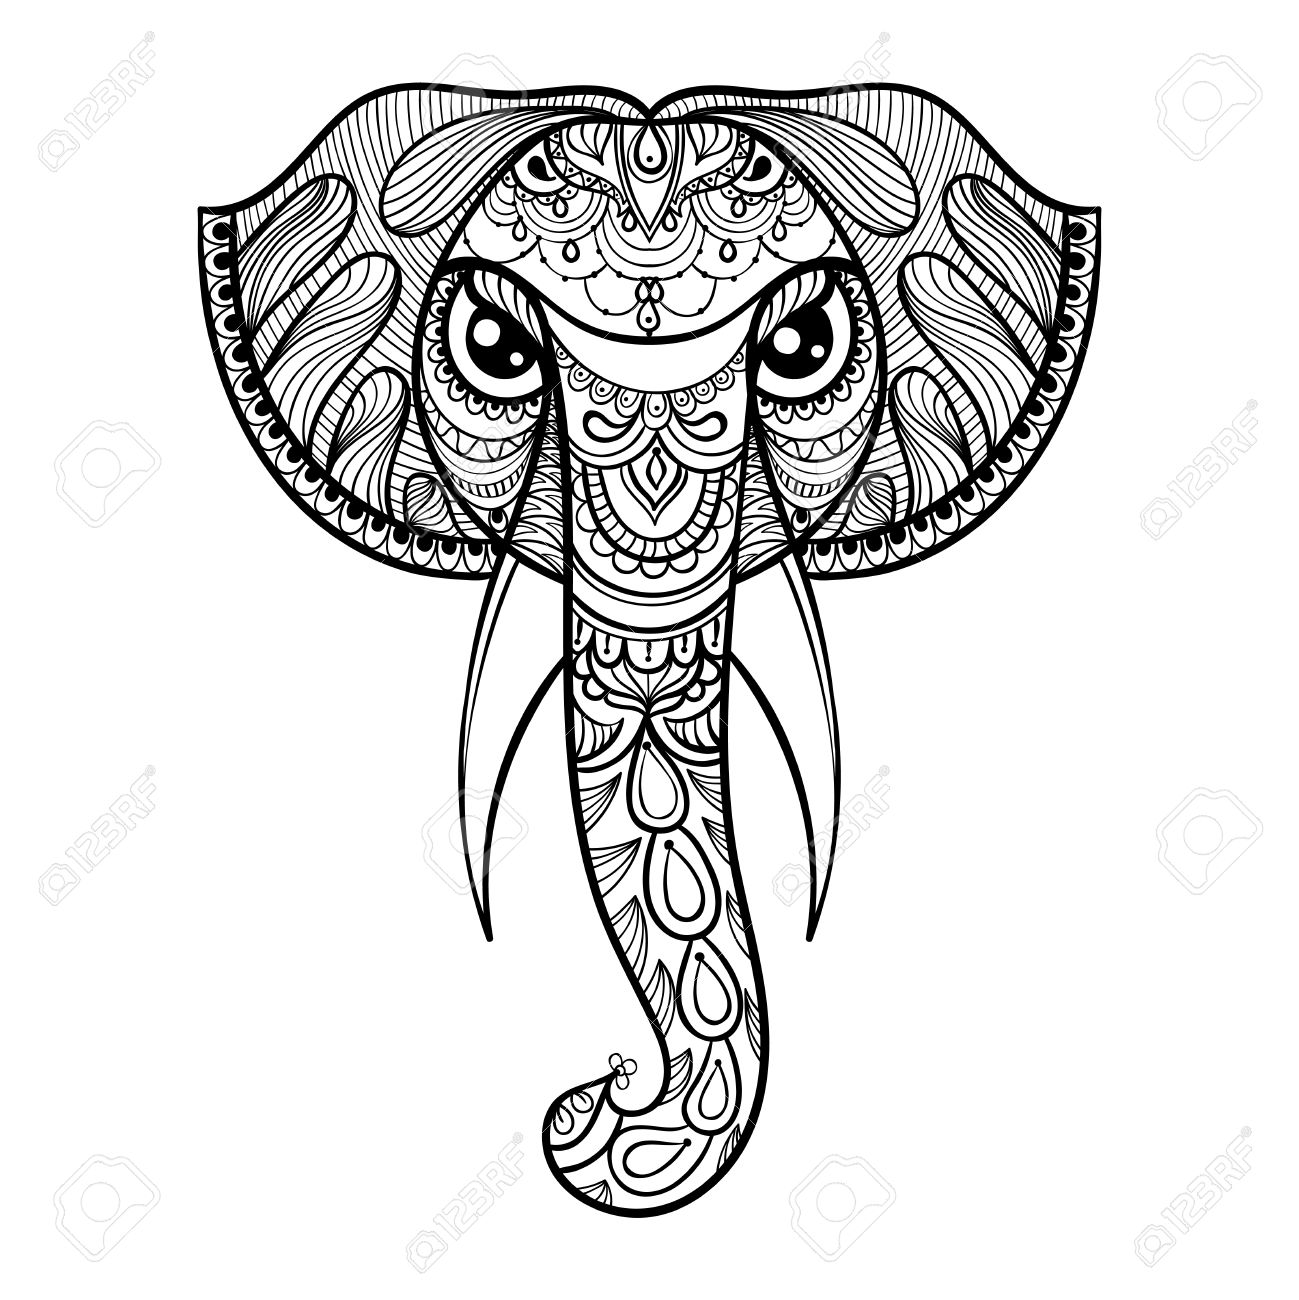 1299x1300 Vector Ornamental Head Of Elephant, Ethnic Zentangled Mascot